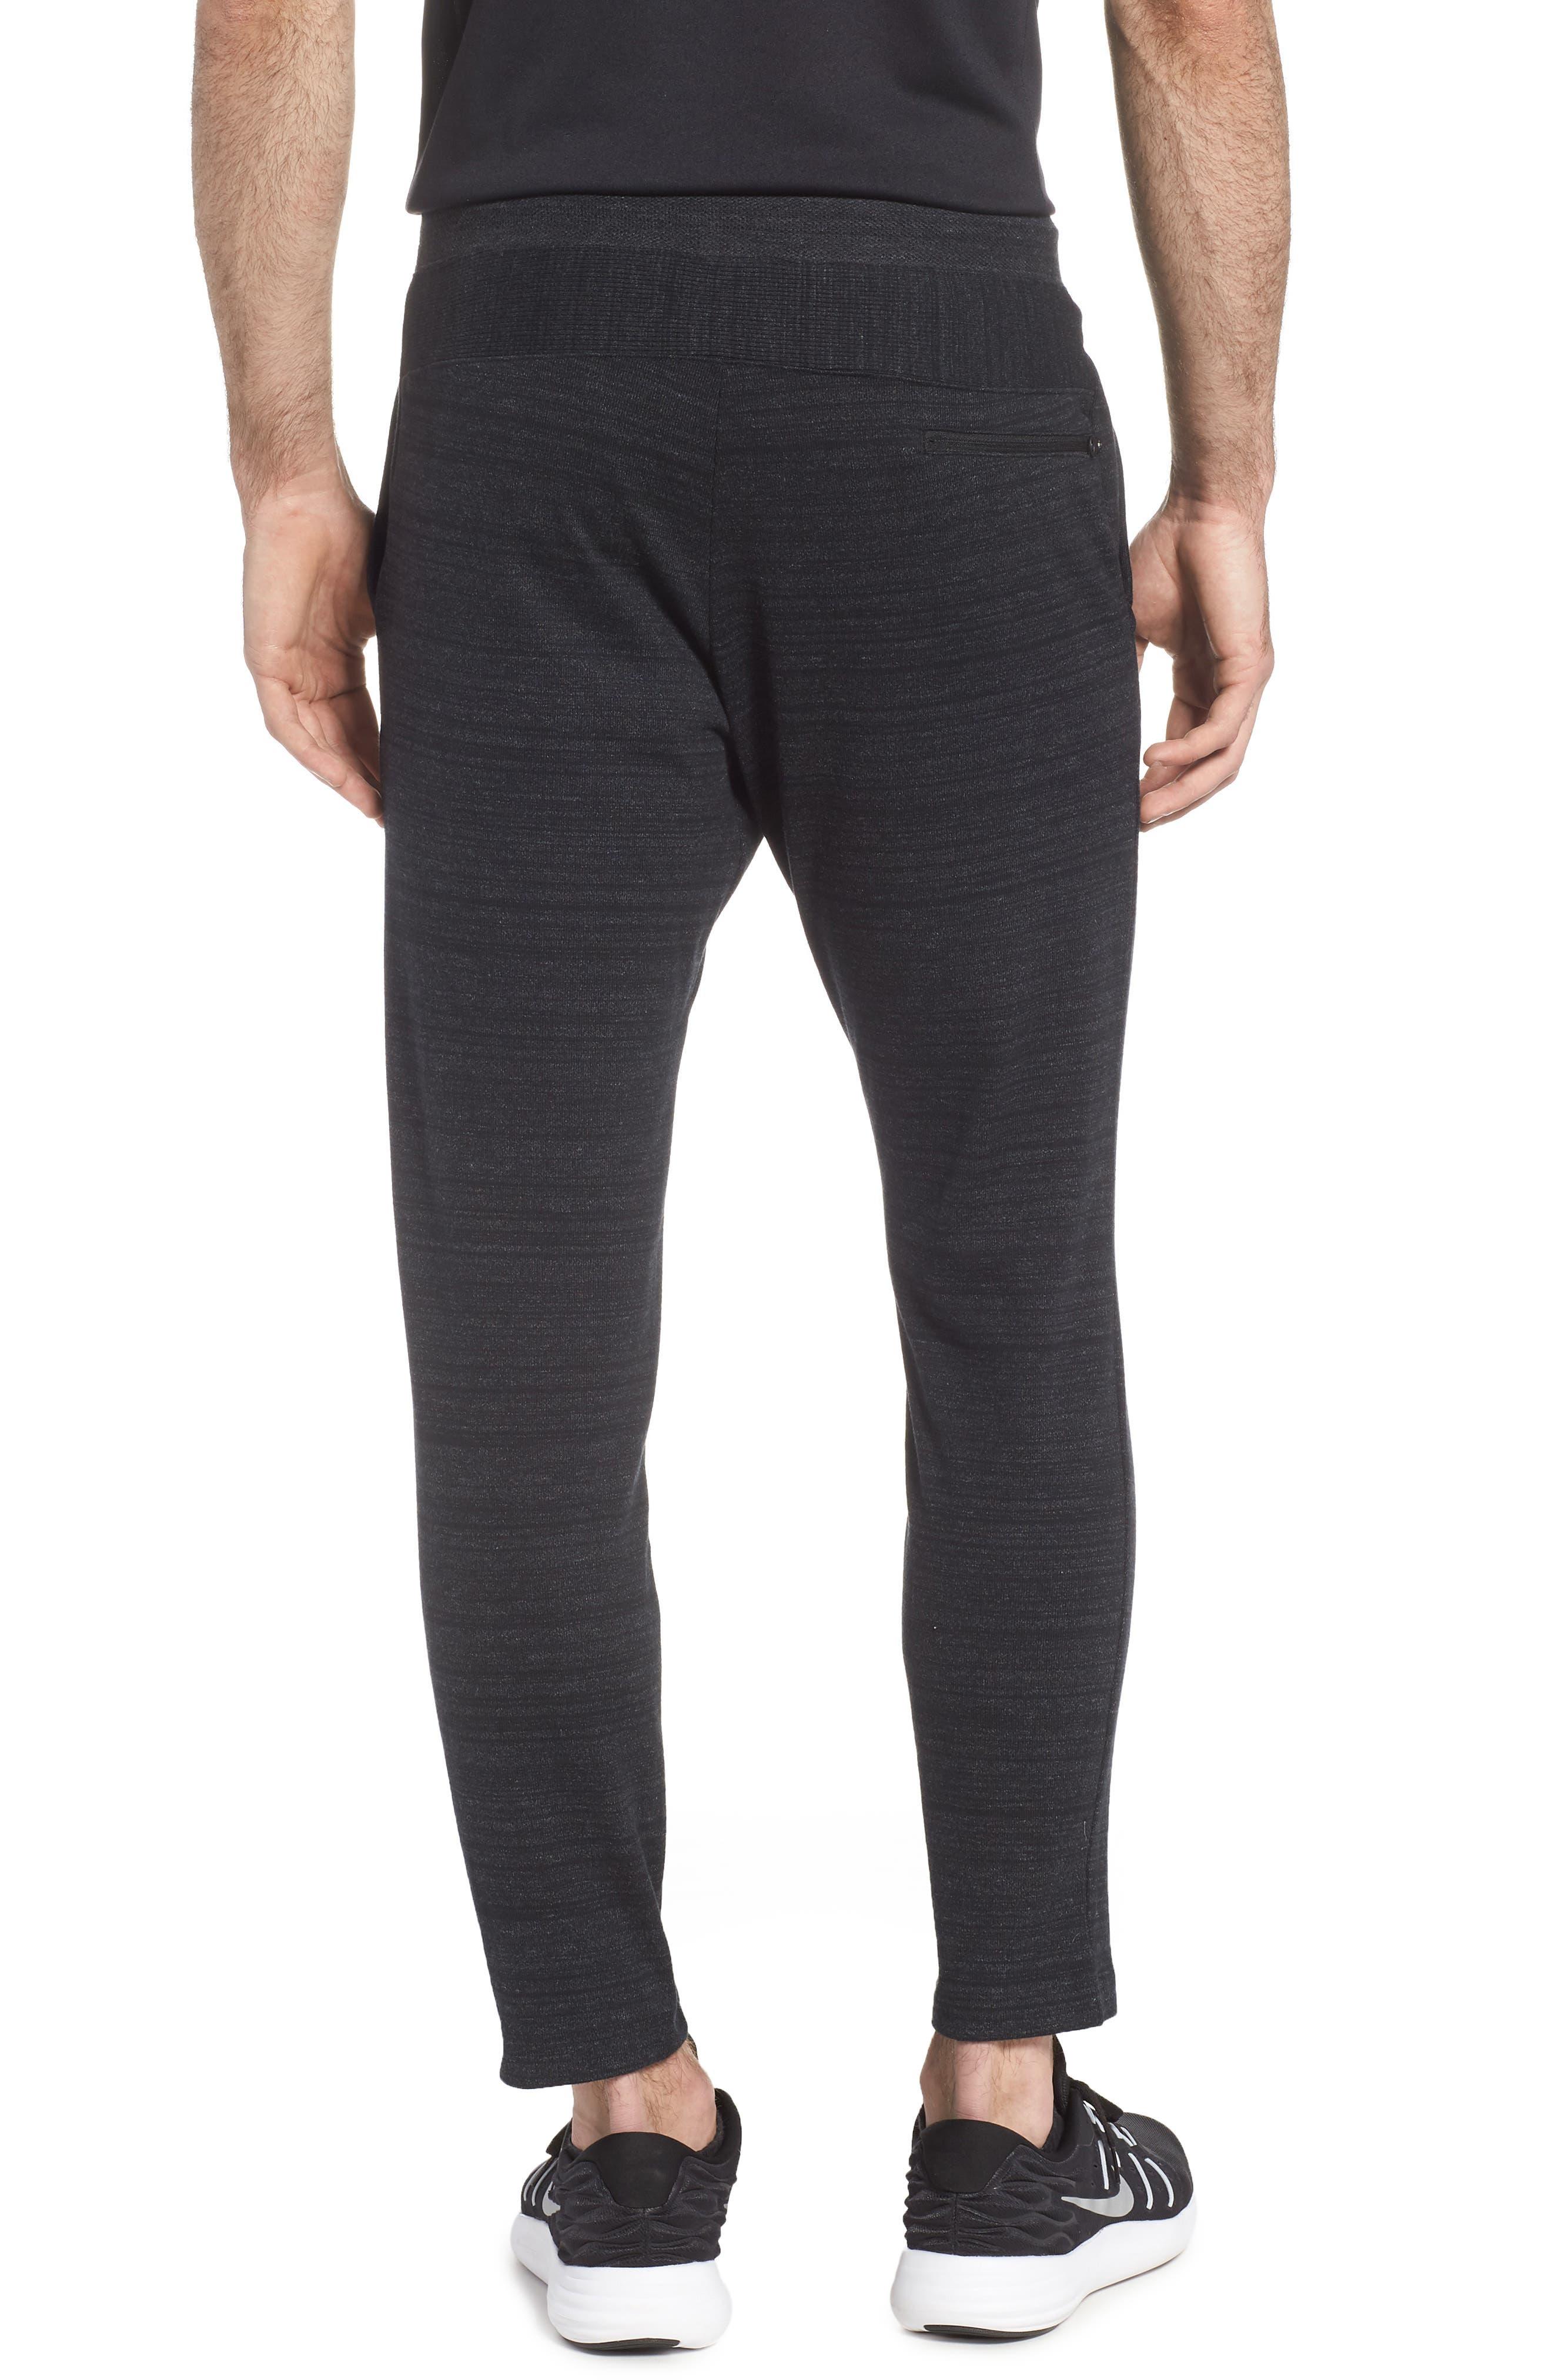 NSW Advance 15 Jogger Pants,                             Alternate thumbnail 2, color,                             BLACK/ HEATHER/ WHITE